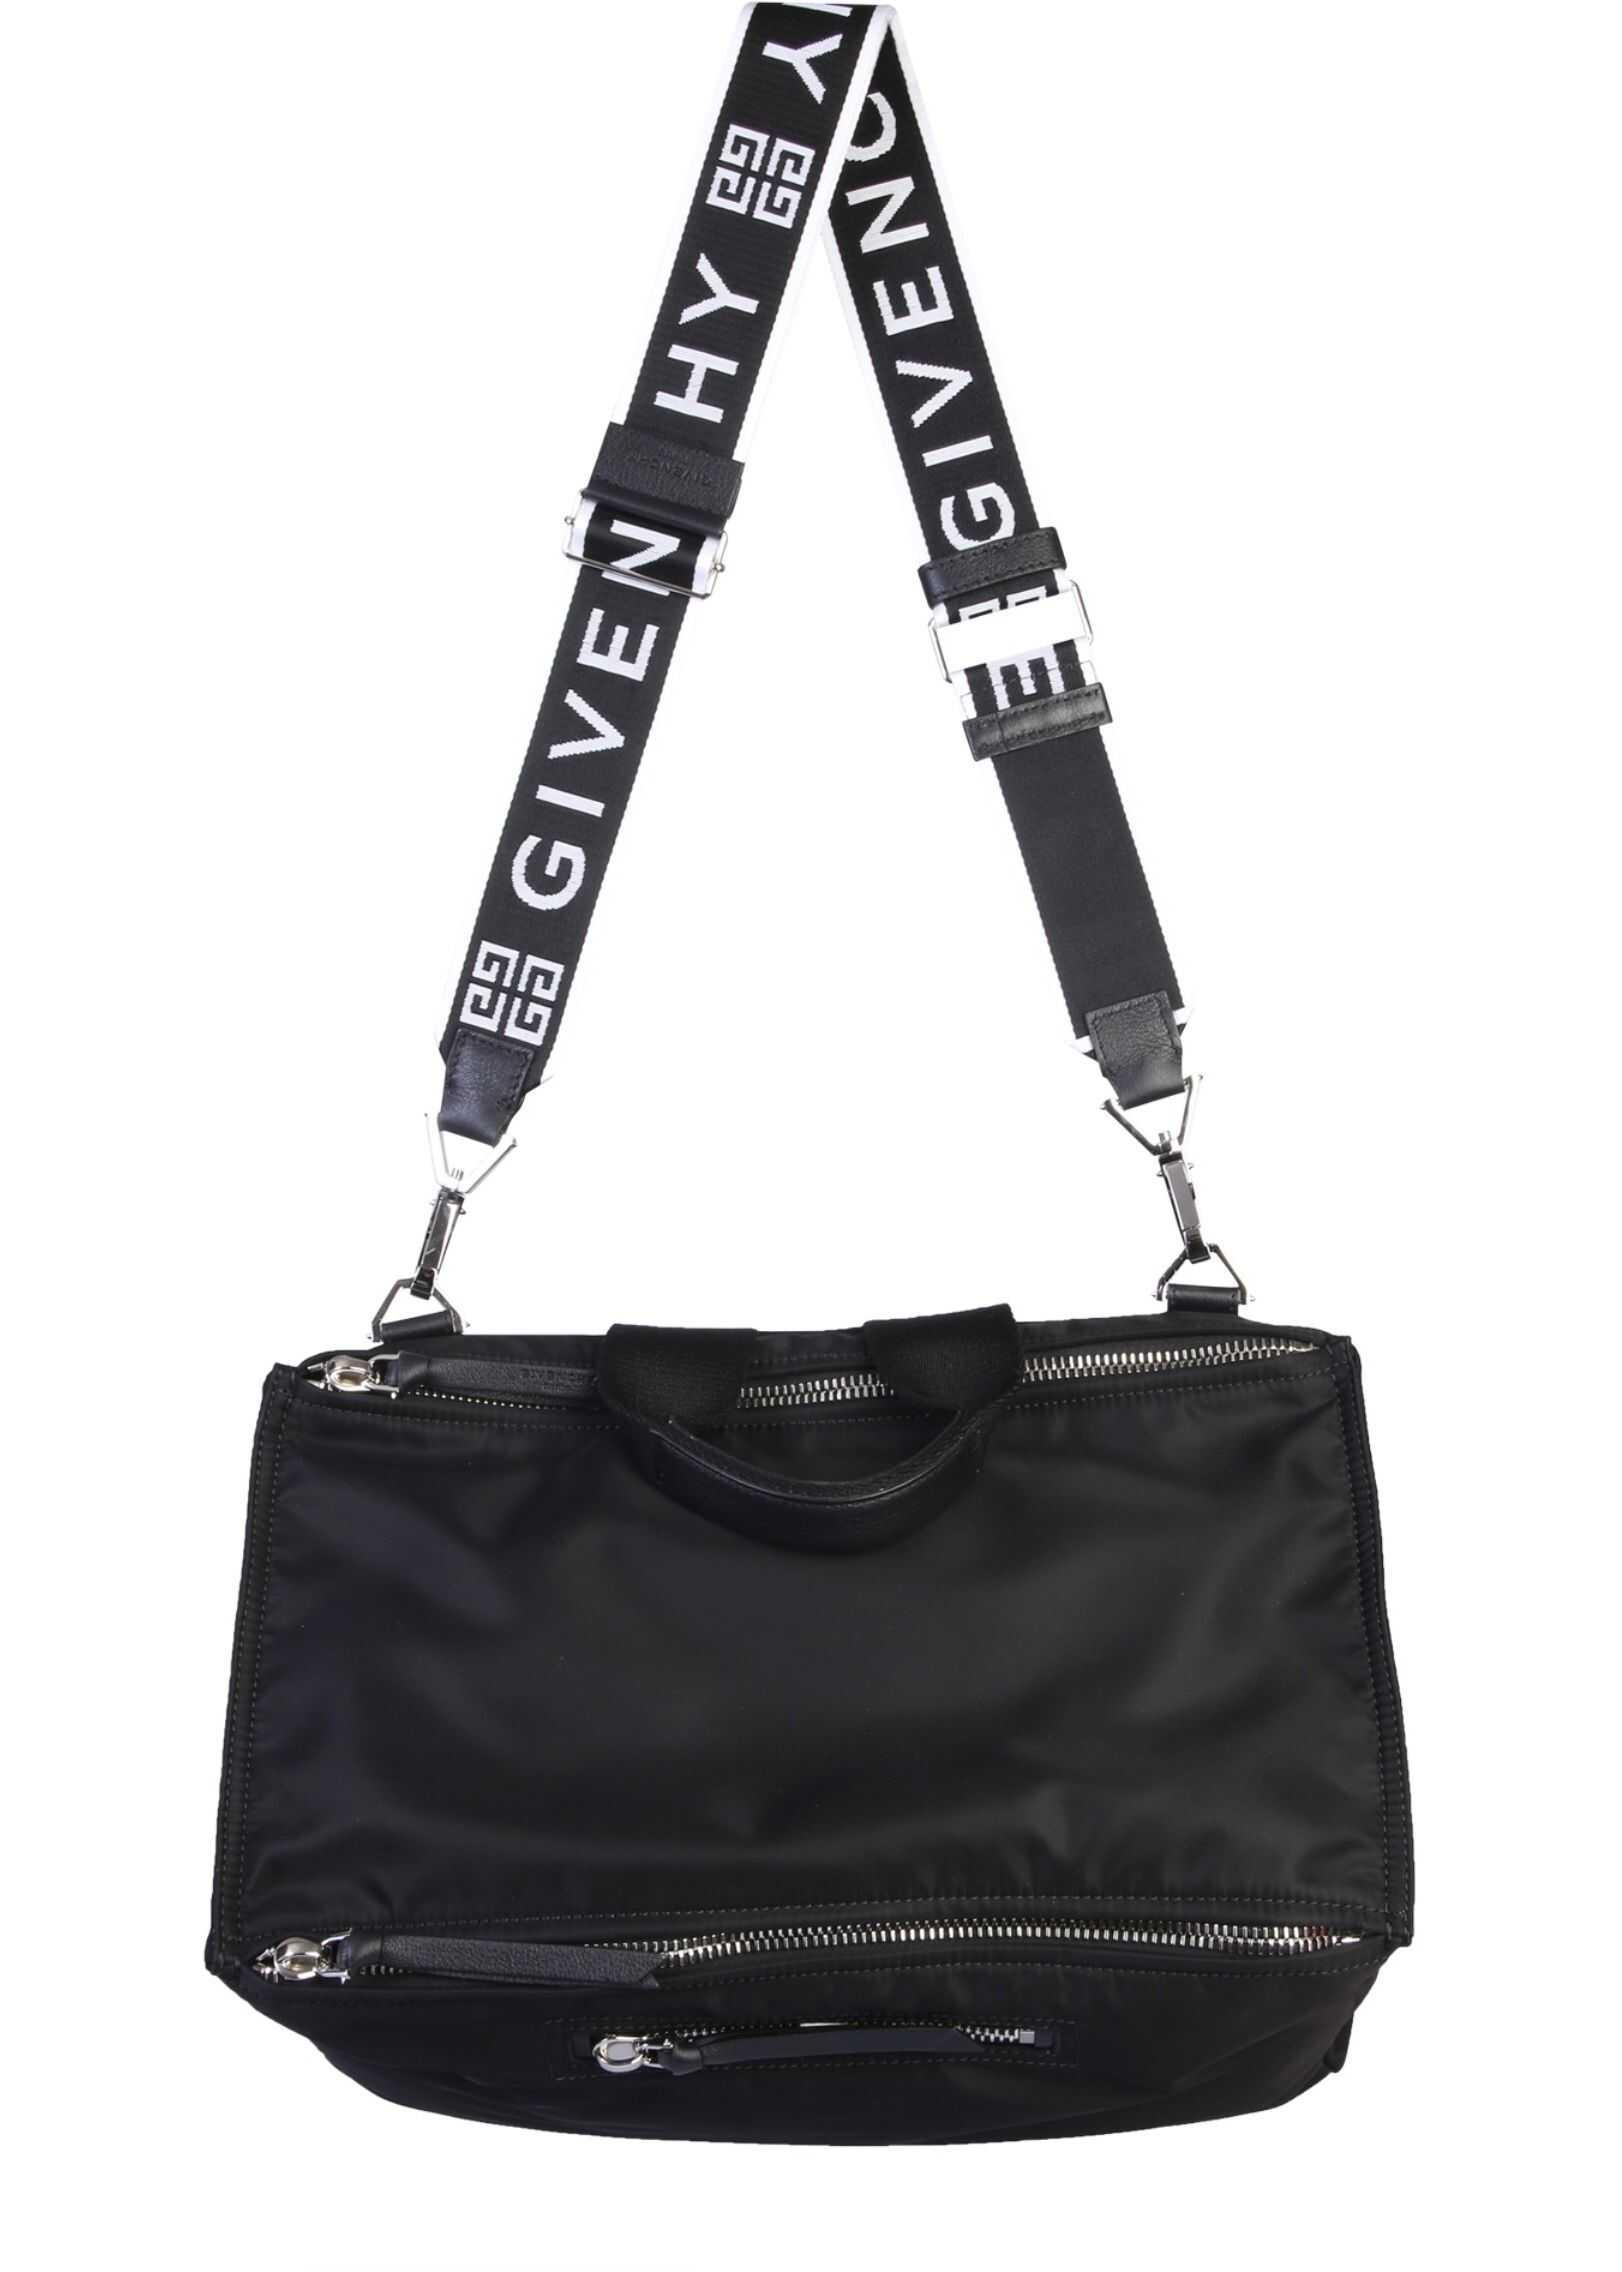 Givenchy Pandora Messanger Bag BLACK